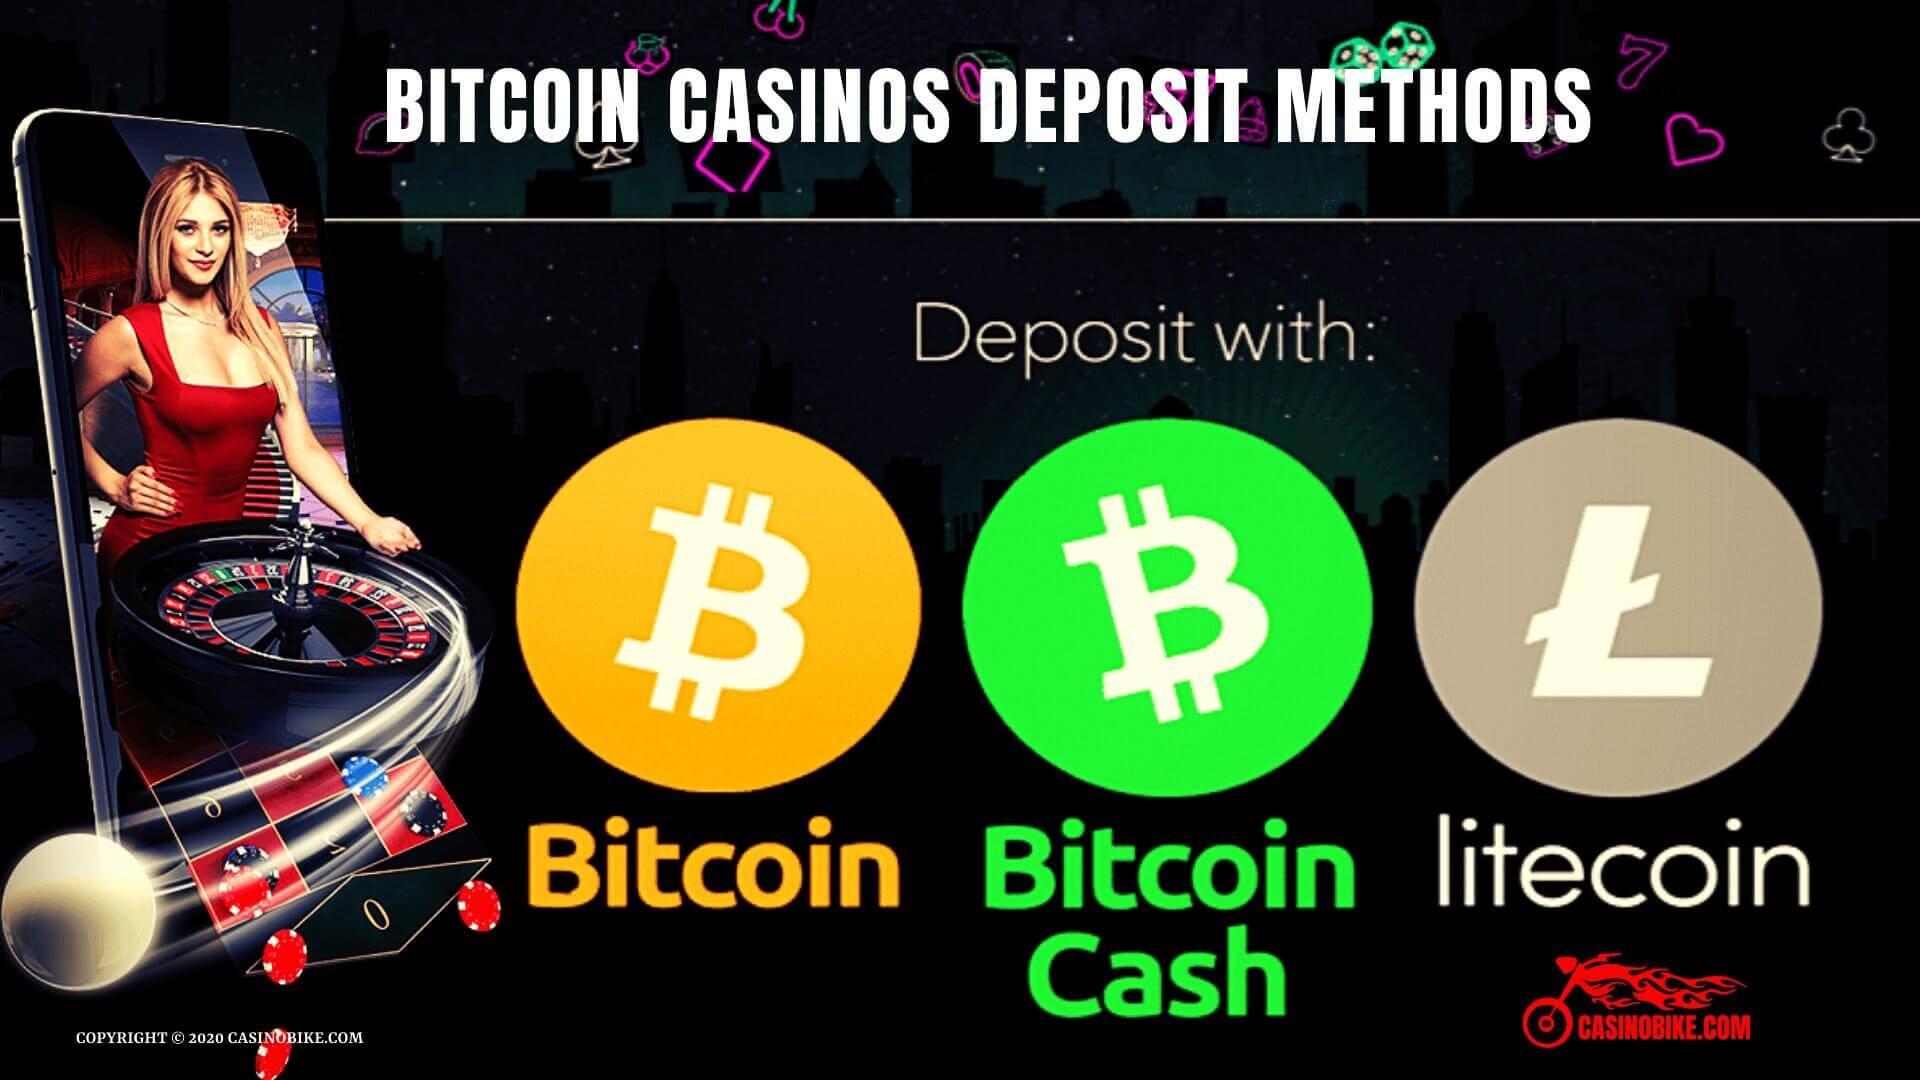 Bitcoin Casinos Deposit Methods